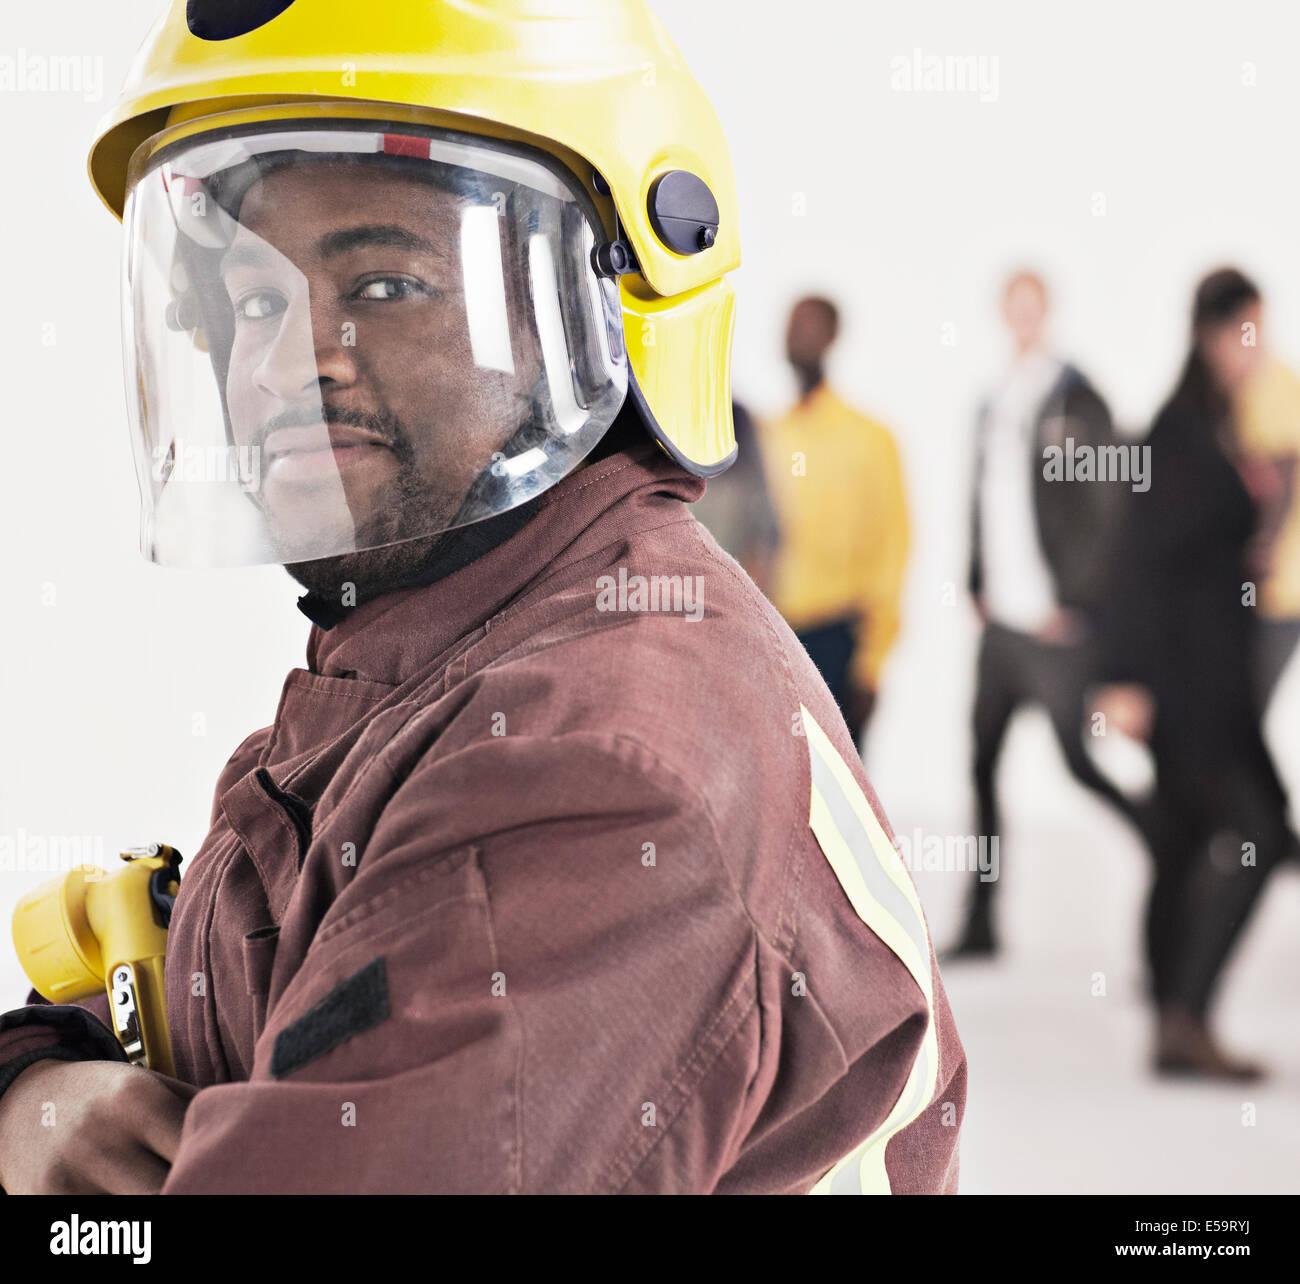 Portrait of confident fireman - Stock Image